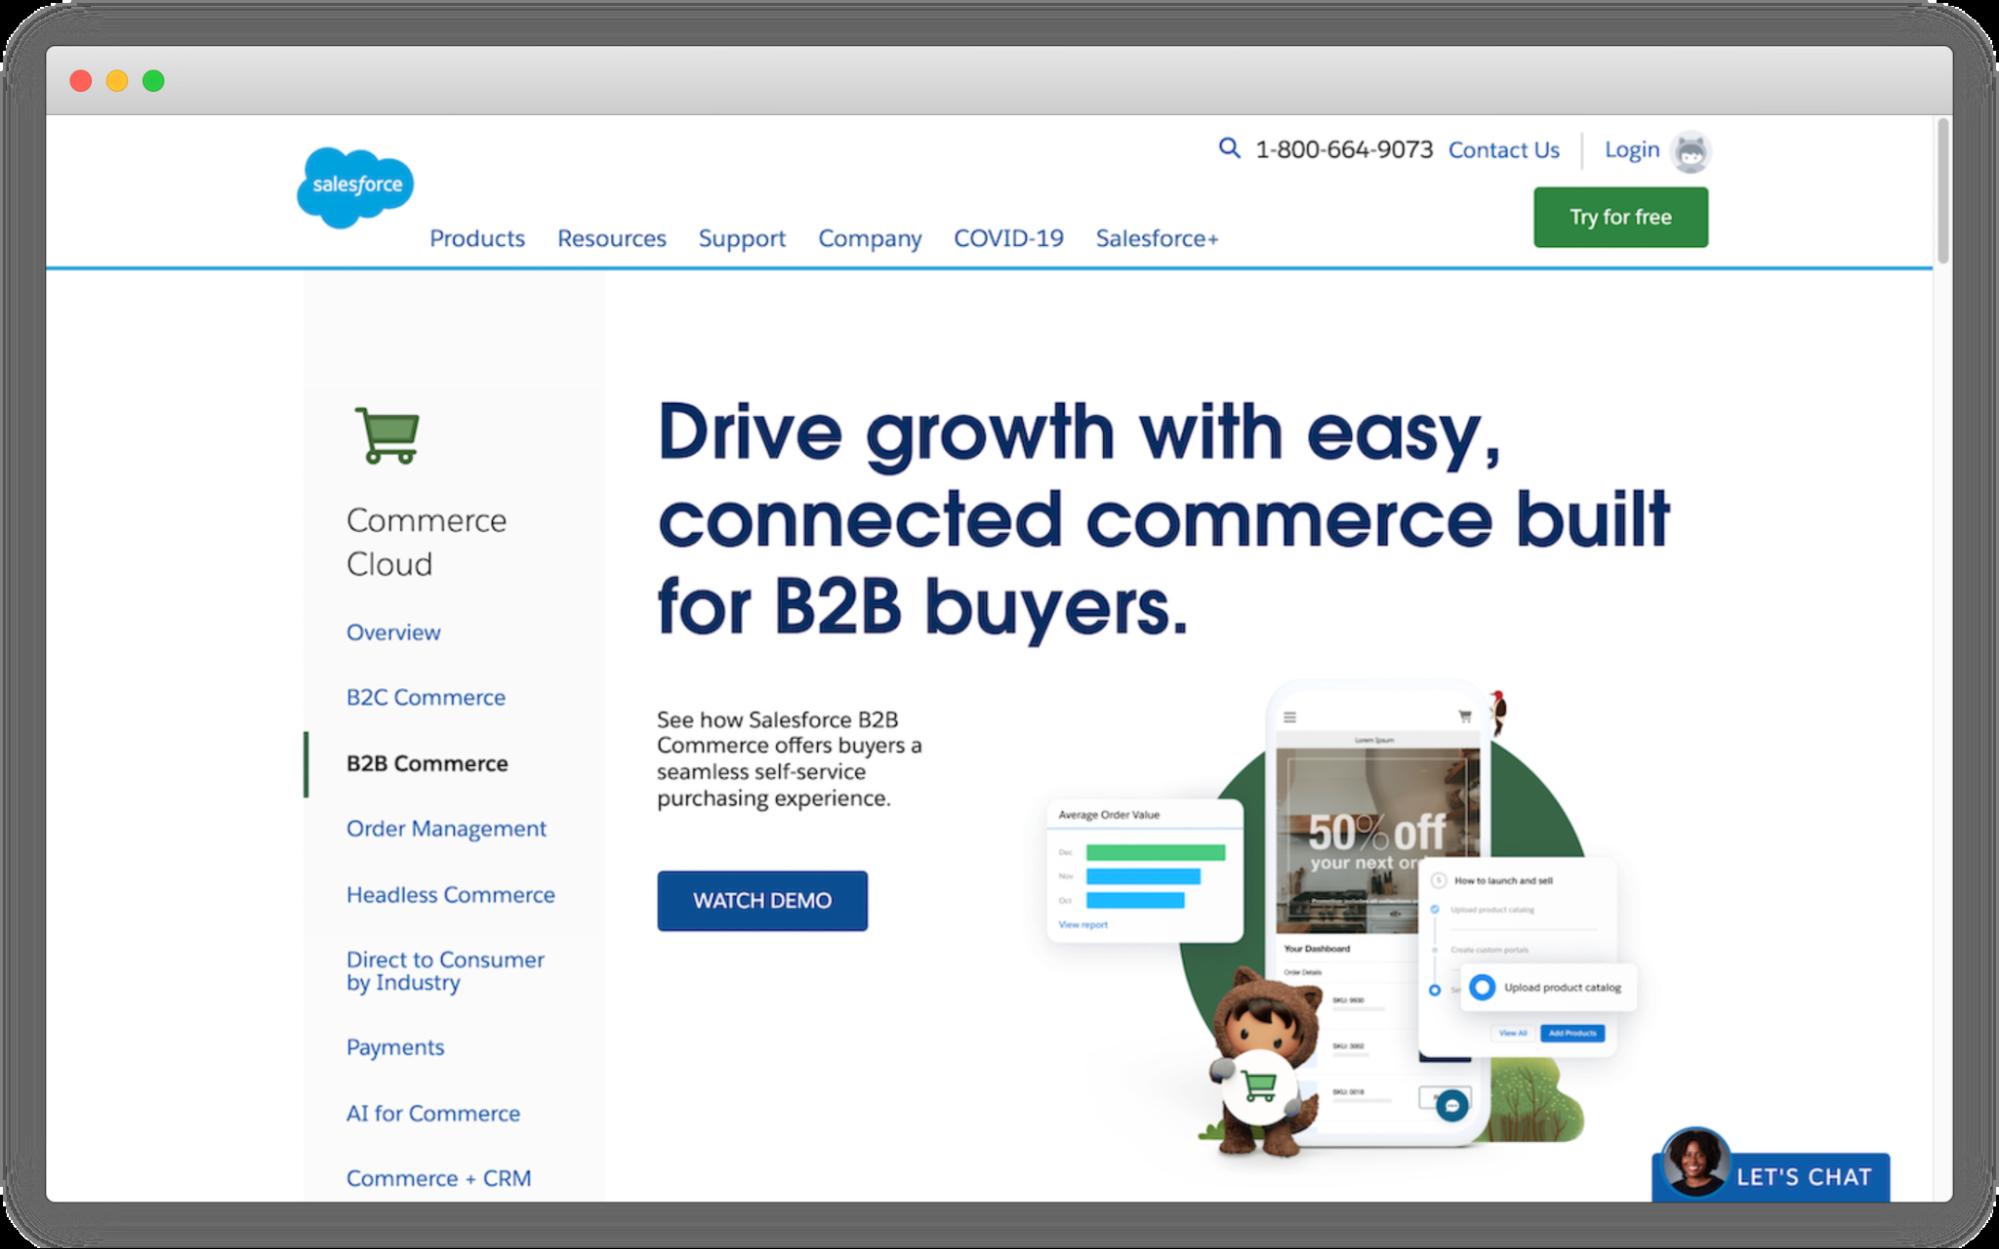 salesforce-b2b-ecommerce-platform